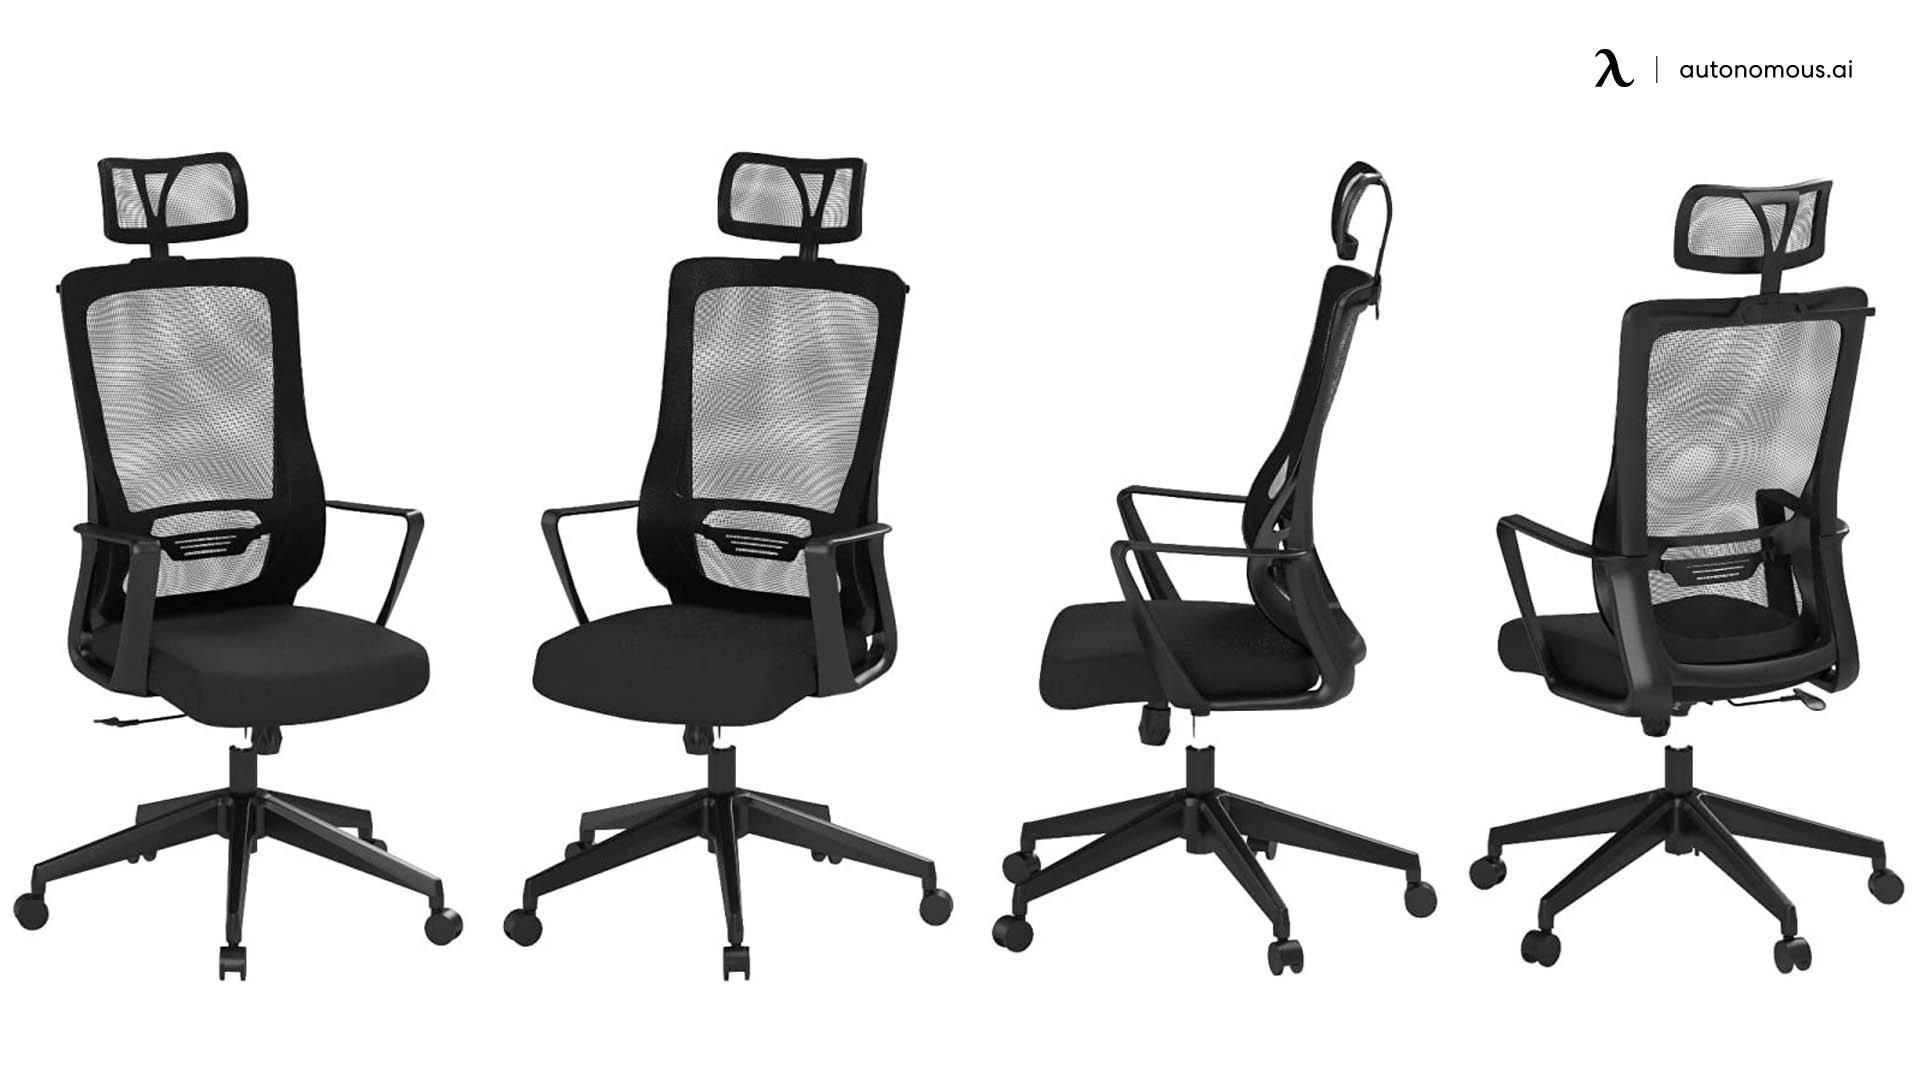 Mimoglad Office Chair